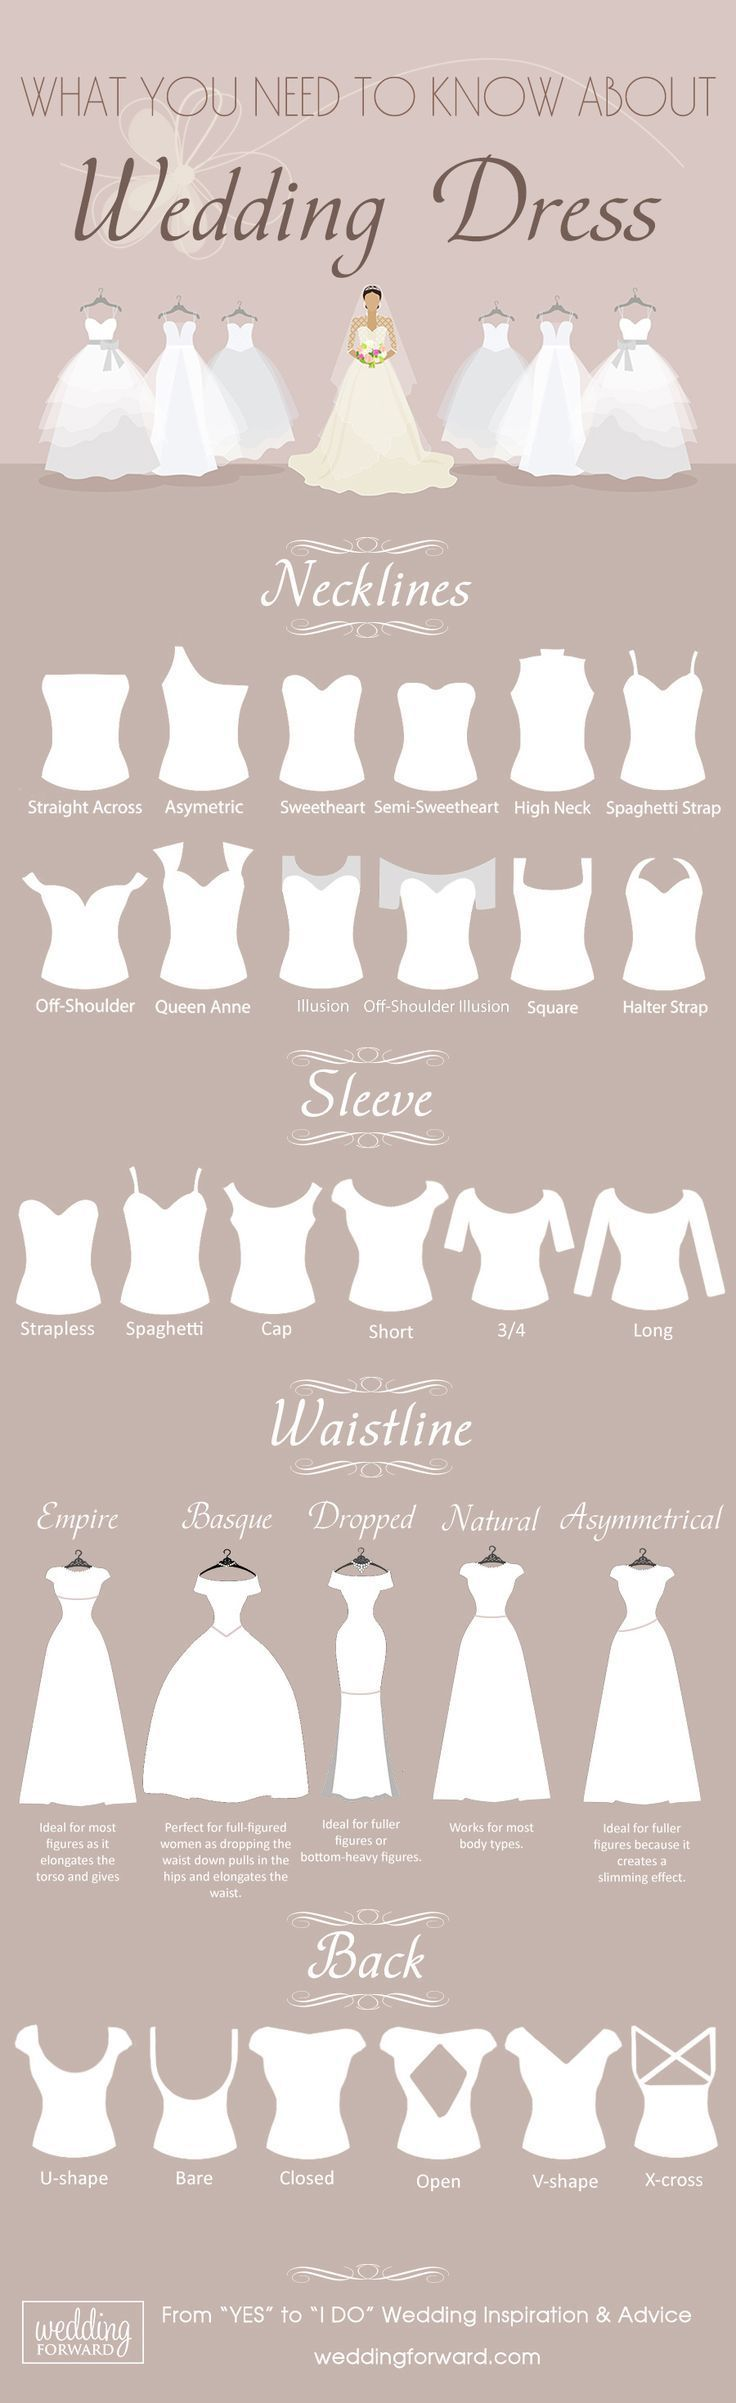 wedding dress guide necklines sleeve waistline back